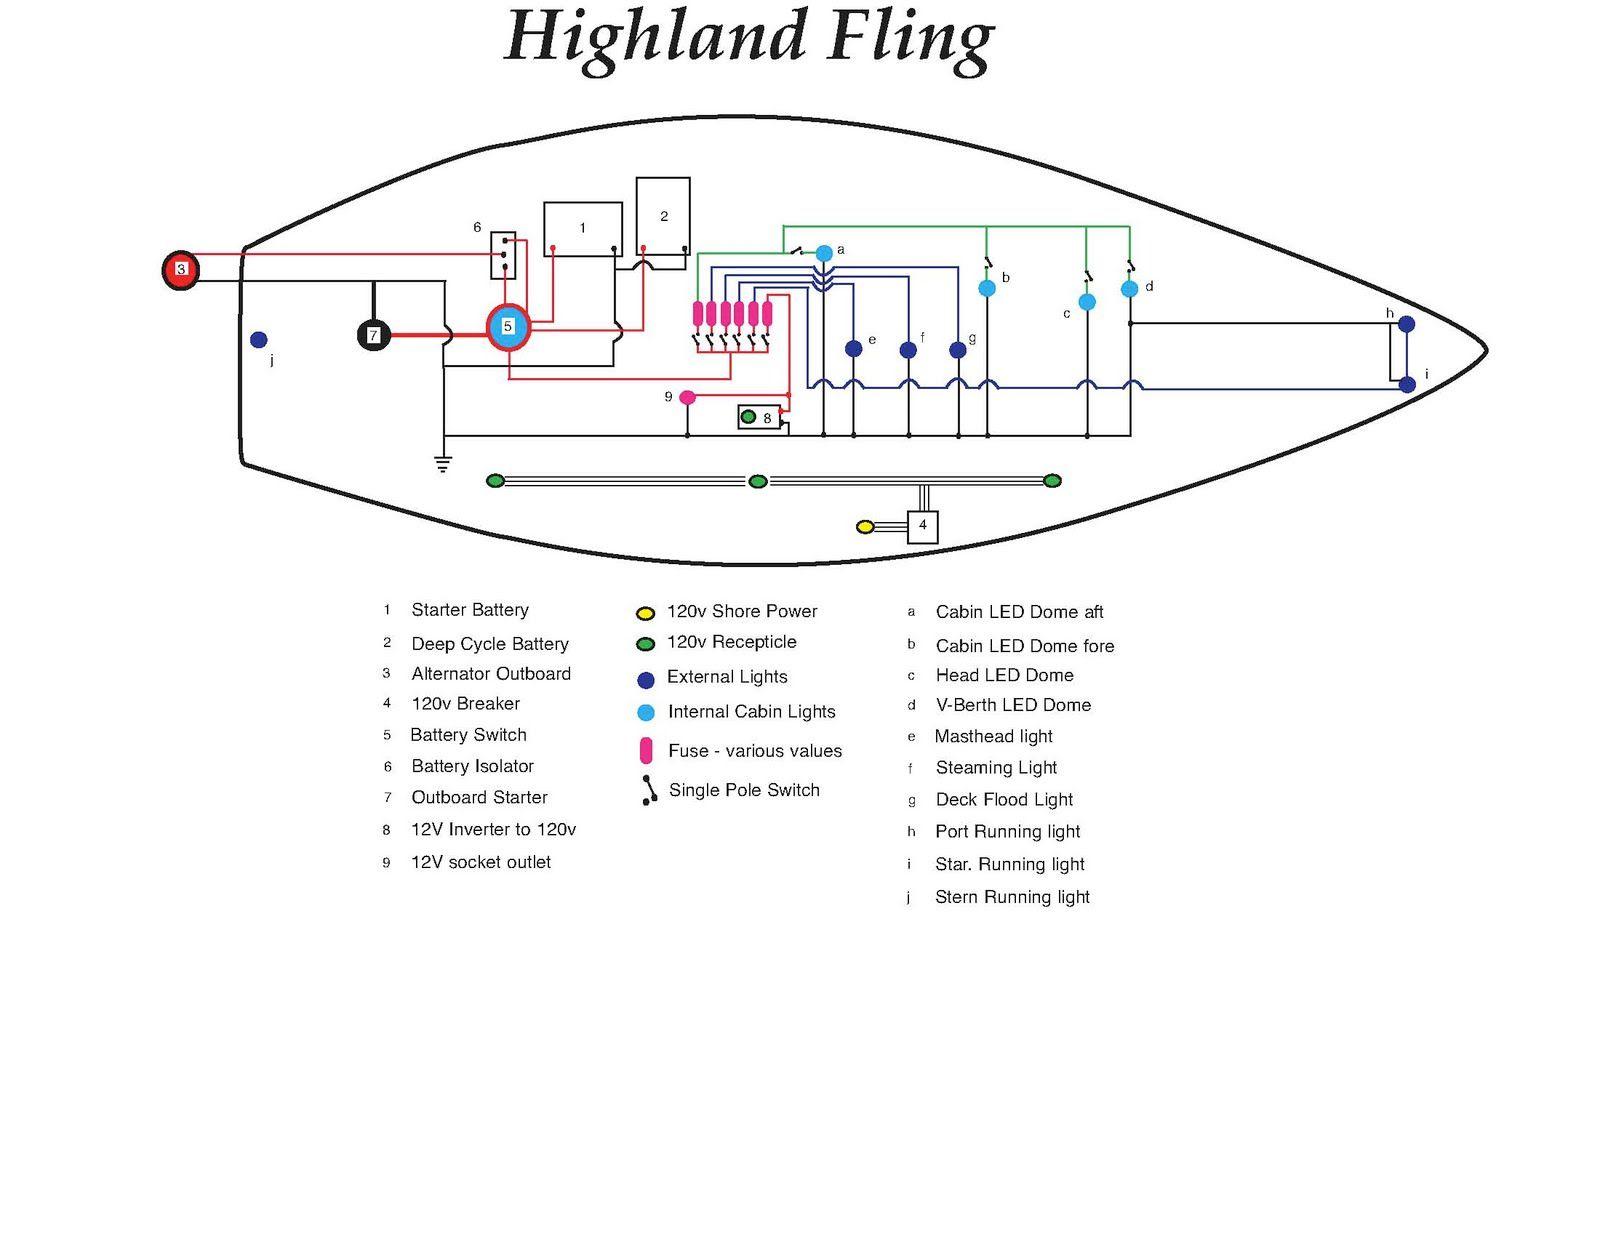 Highland Fling, my Grampian 26 Sailboat  Wiring Diagram